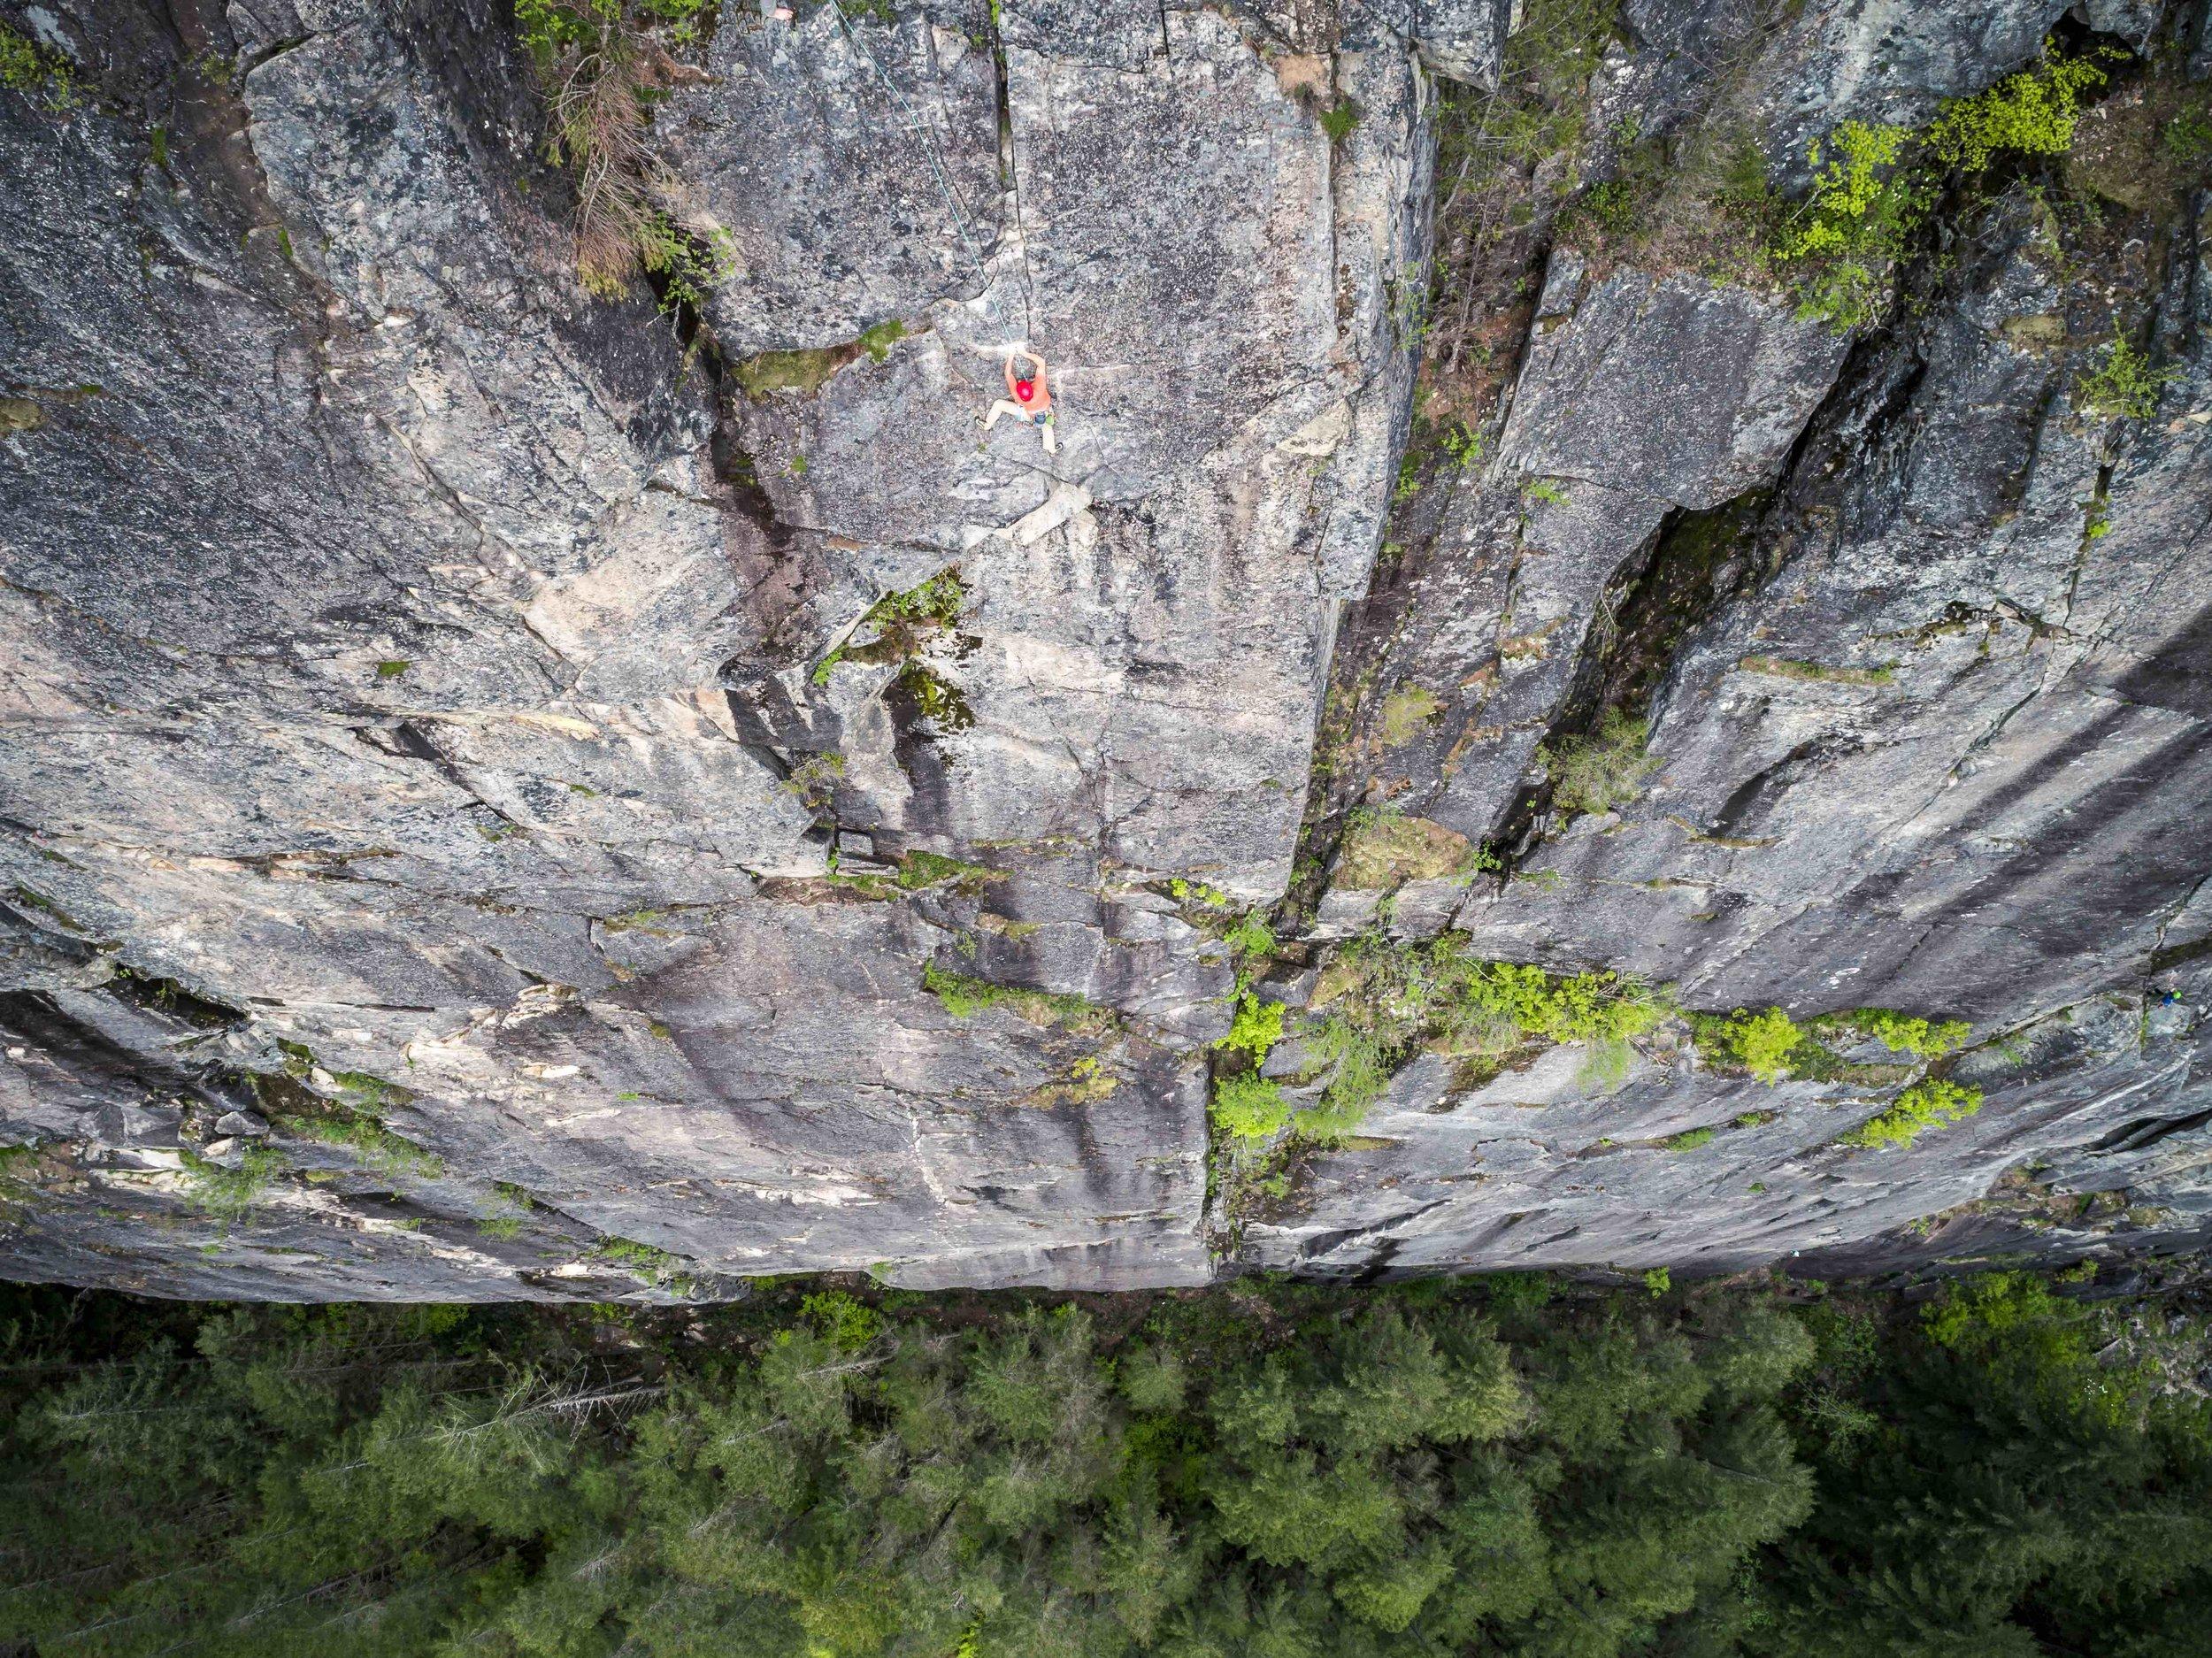 Rock_Climbing_Drone_Birds_Eye_View_Looking_Down_Cliff_Web.jpg